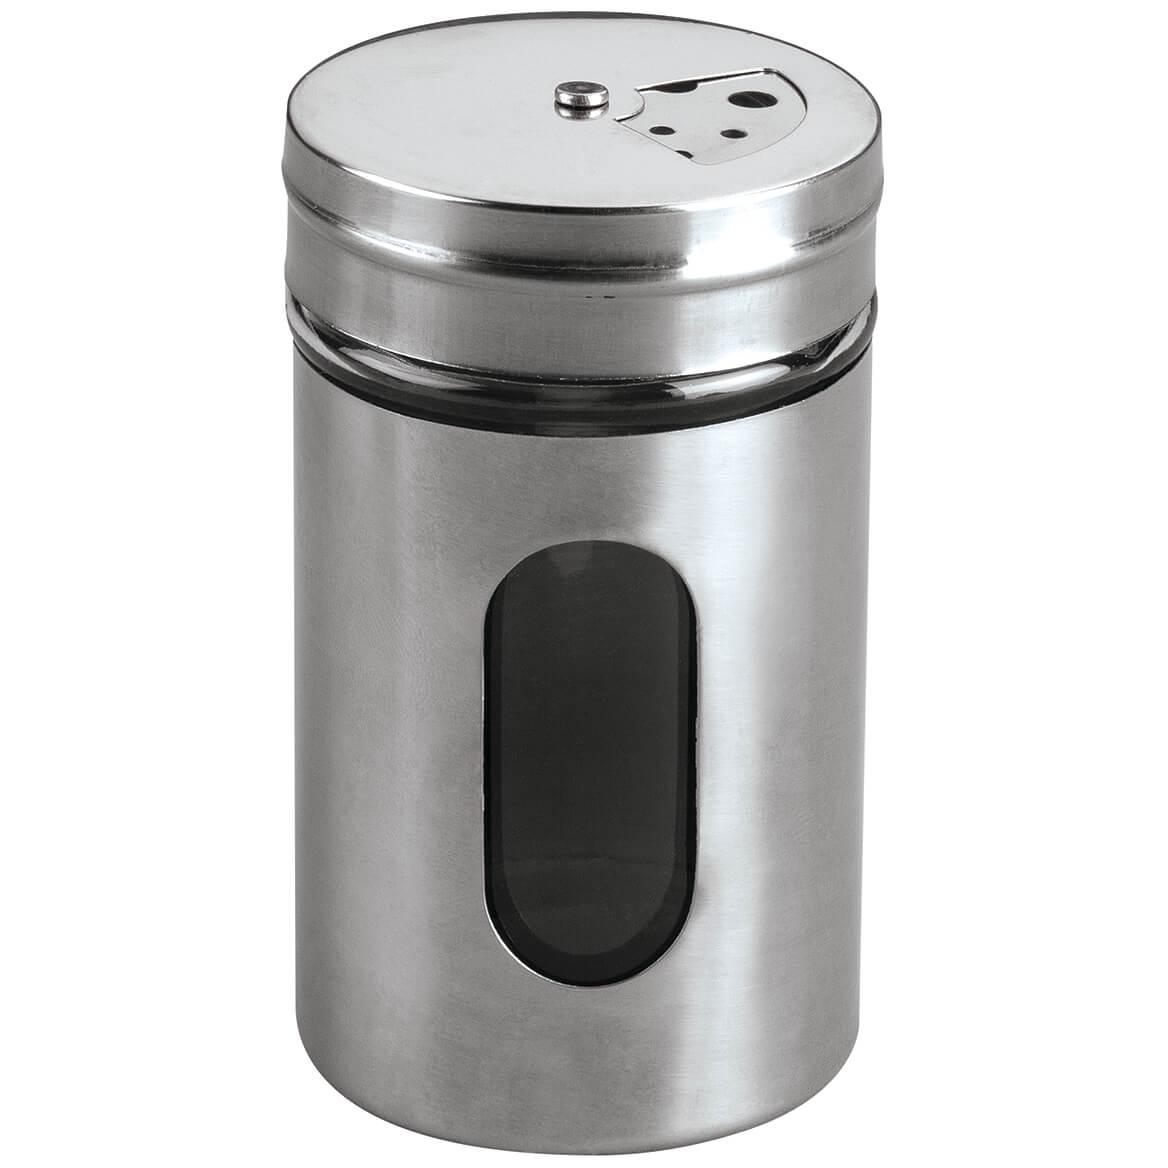 Stainless Steel Spice Jar-371391